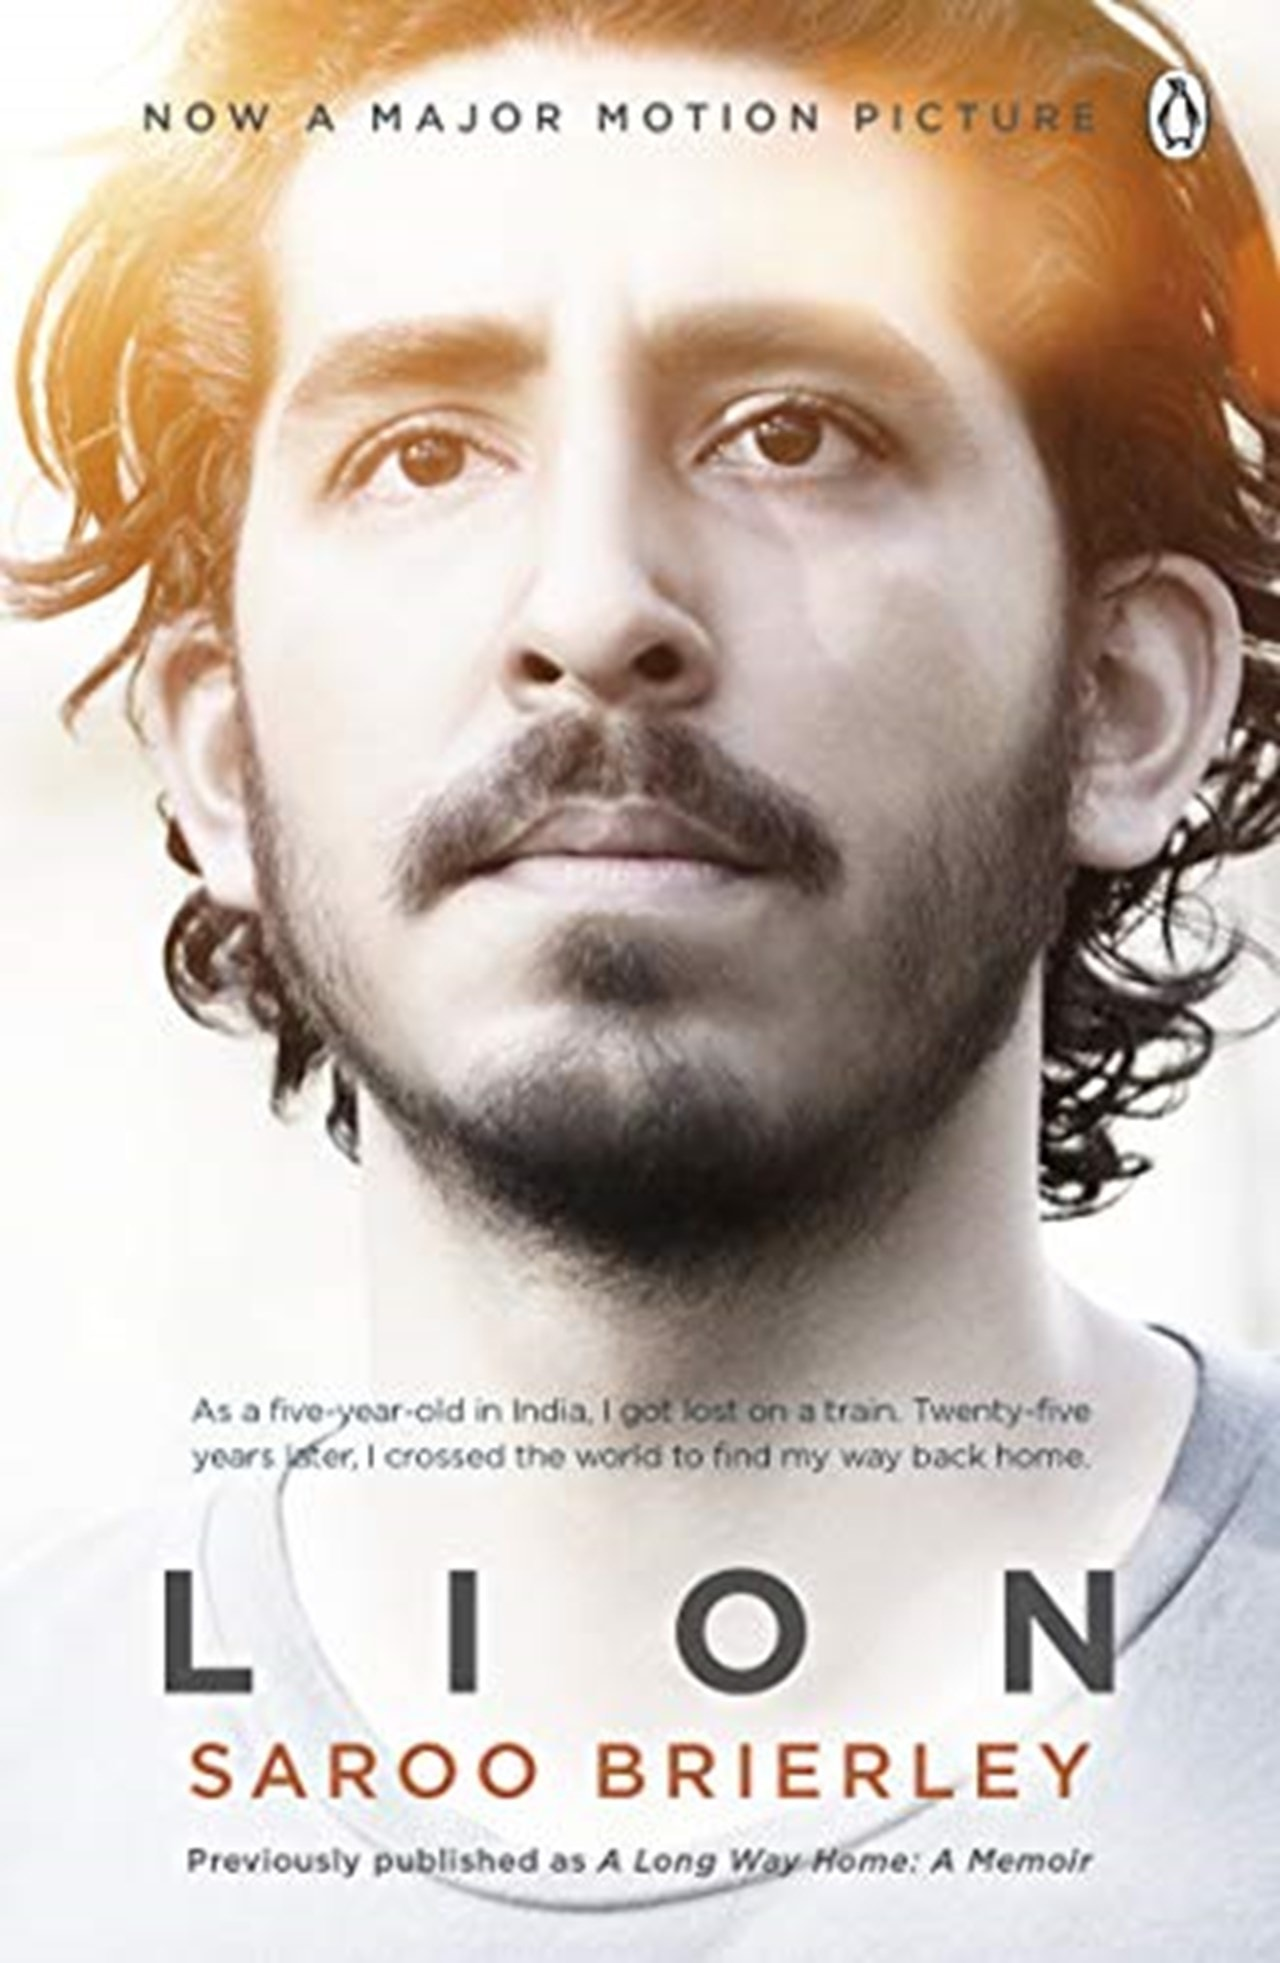 Lion (A Long Way Home) - 1